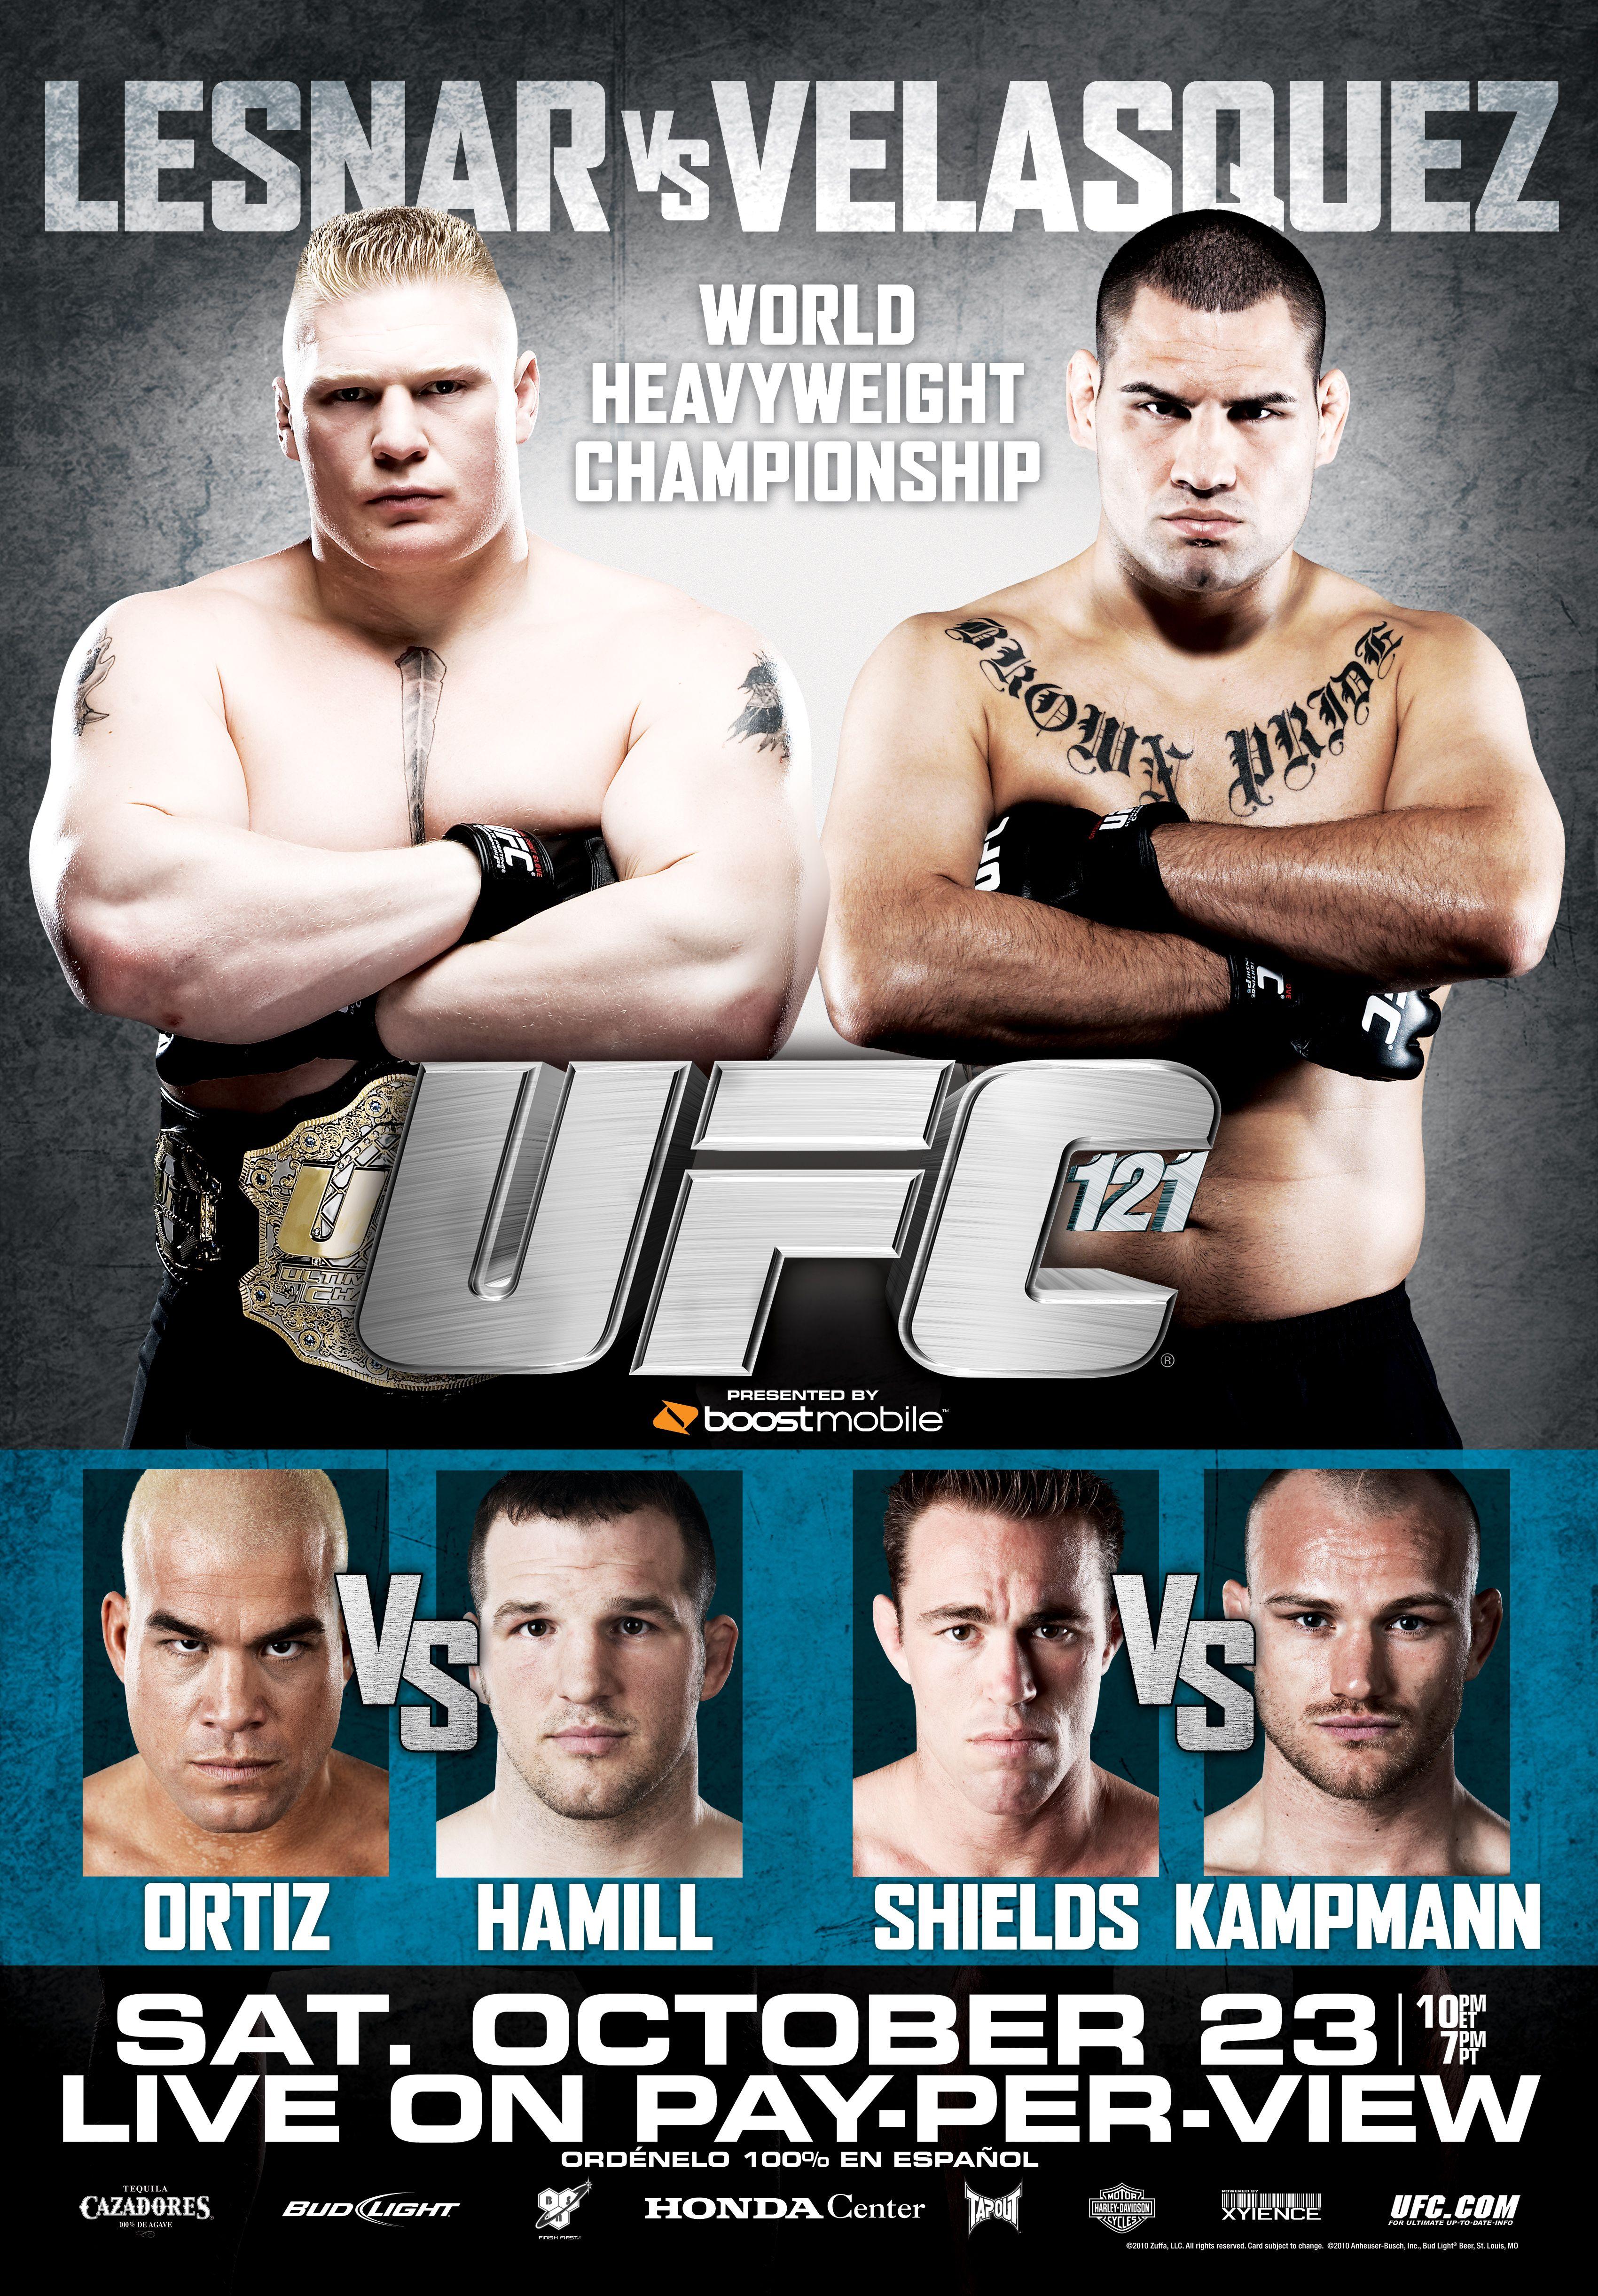 UFC 121: Lesnar Vs. Velasquez ...